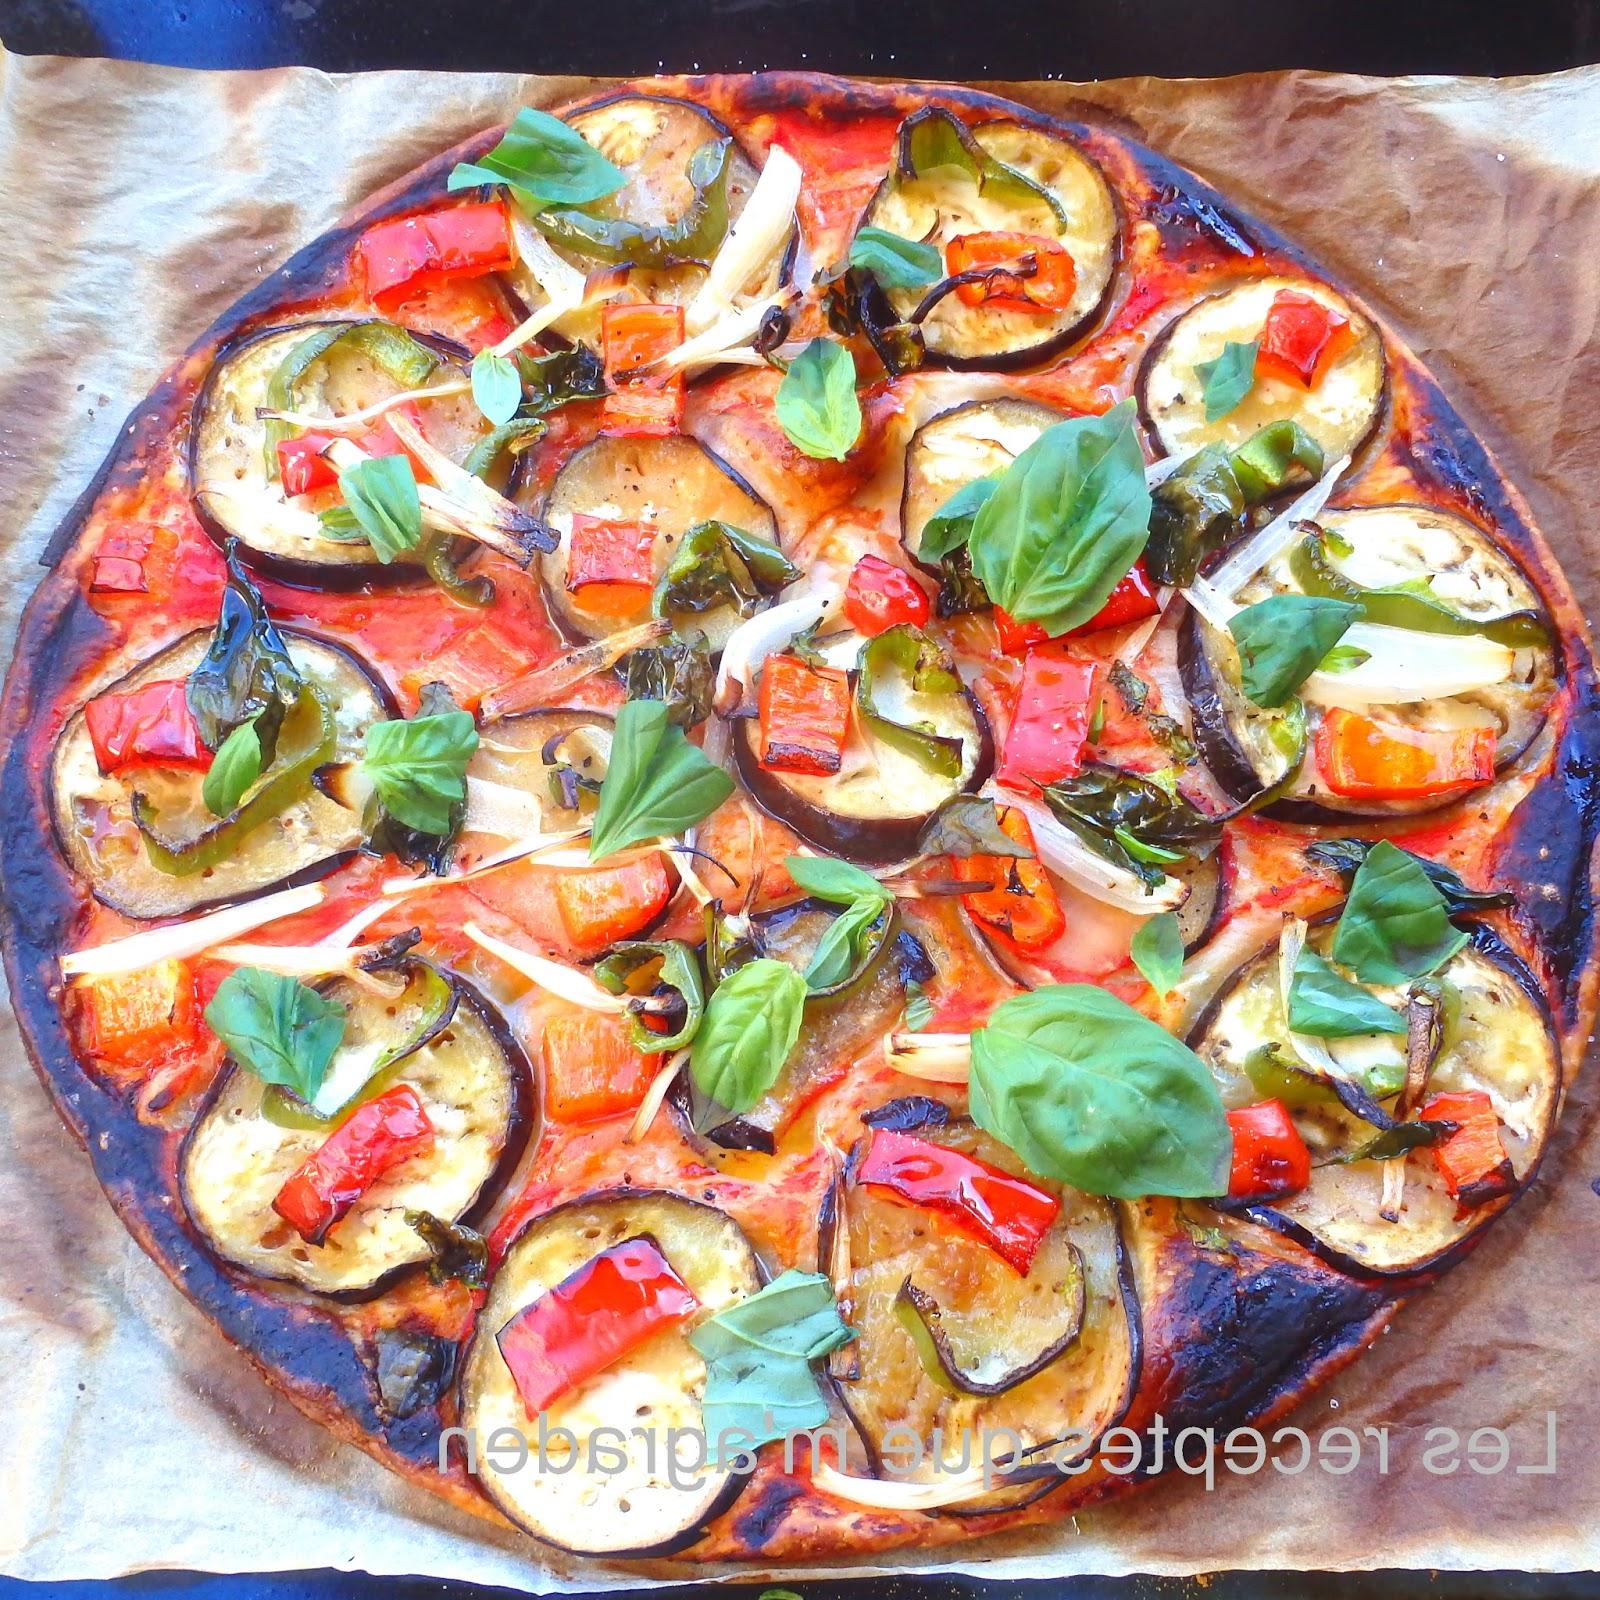 Pizza Vegetal Ffdn Les Receptes Que M Agraden Pizza Ve Al Con Hojaldre